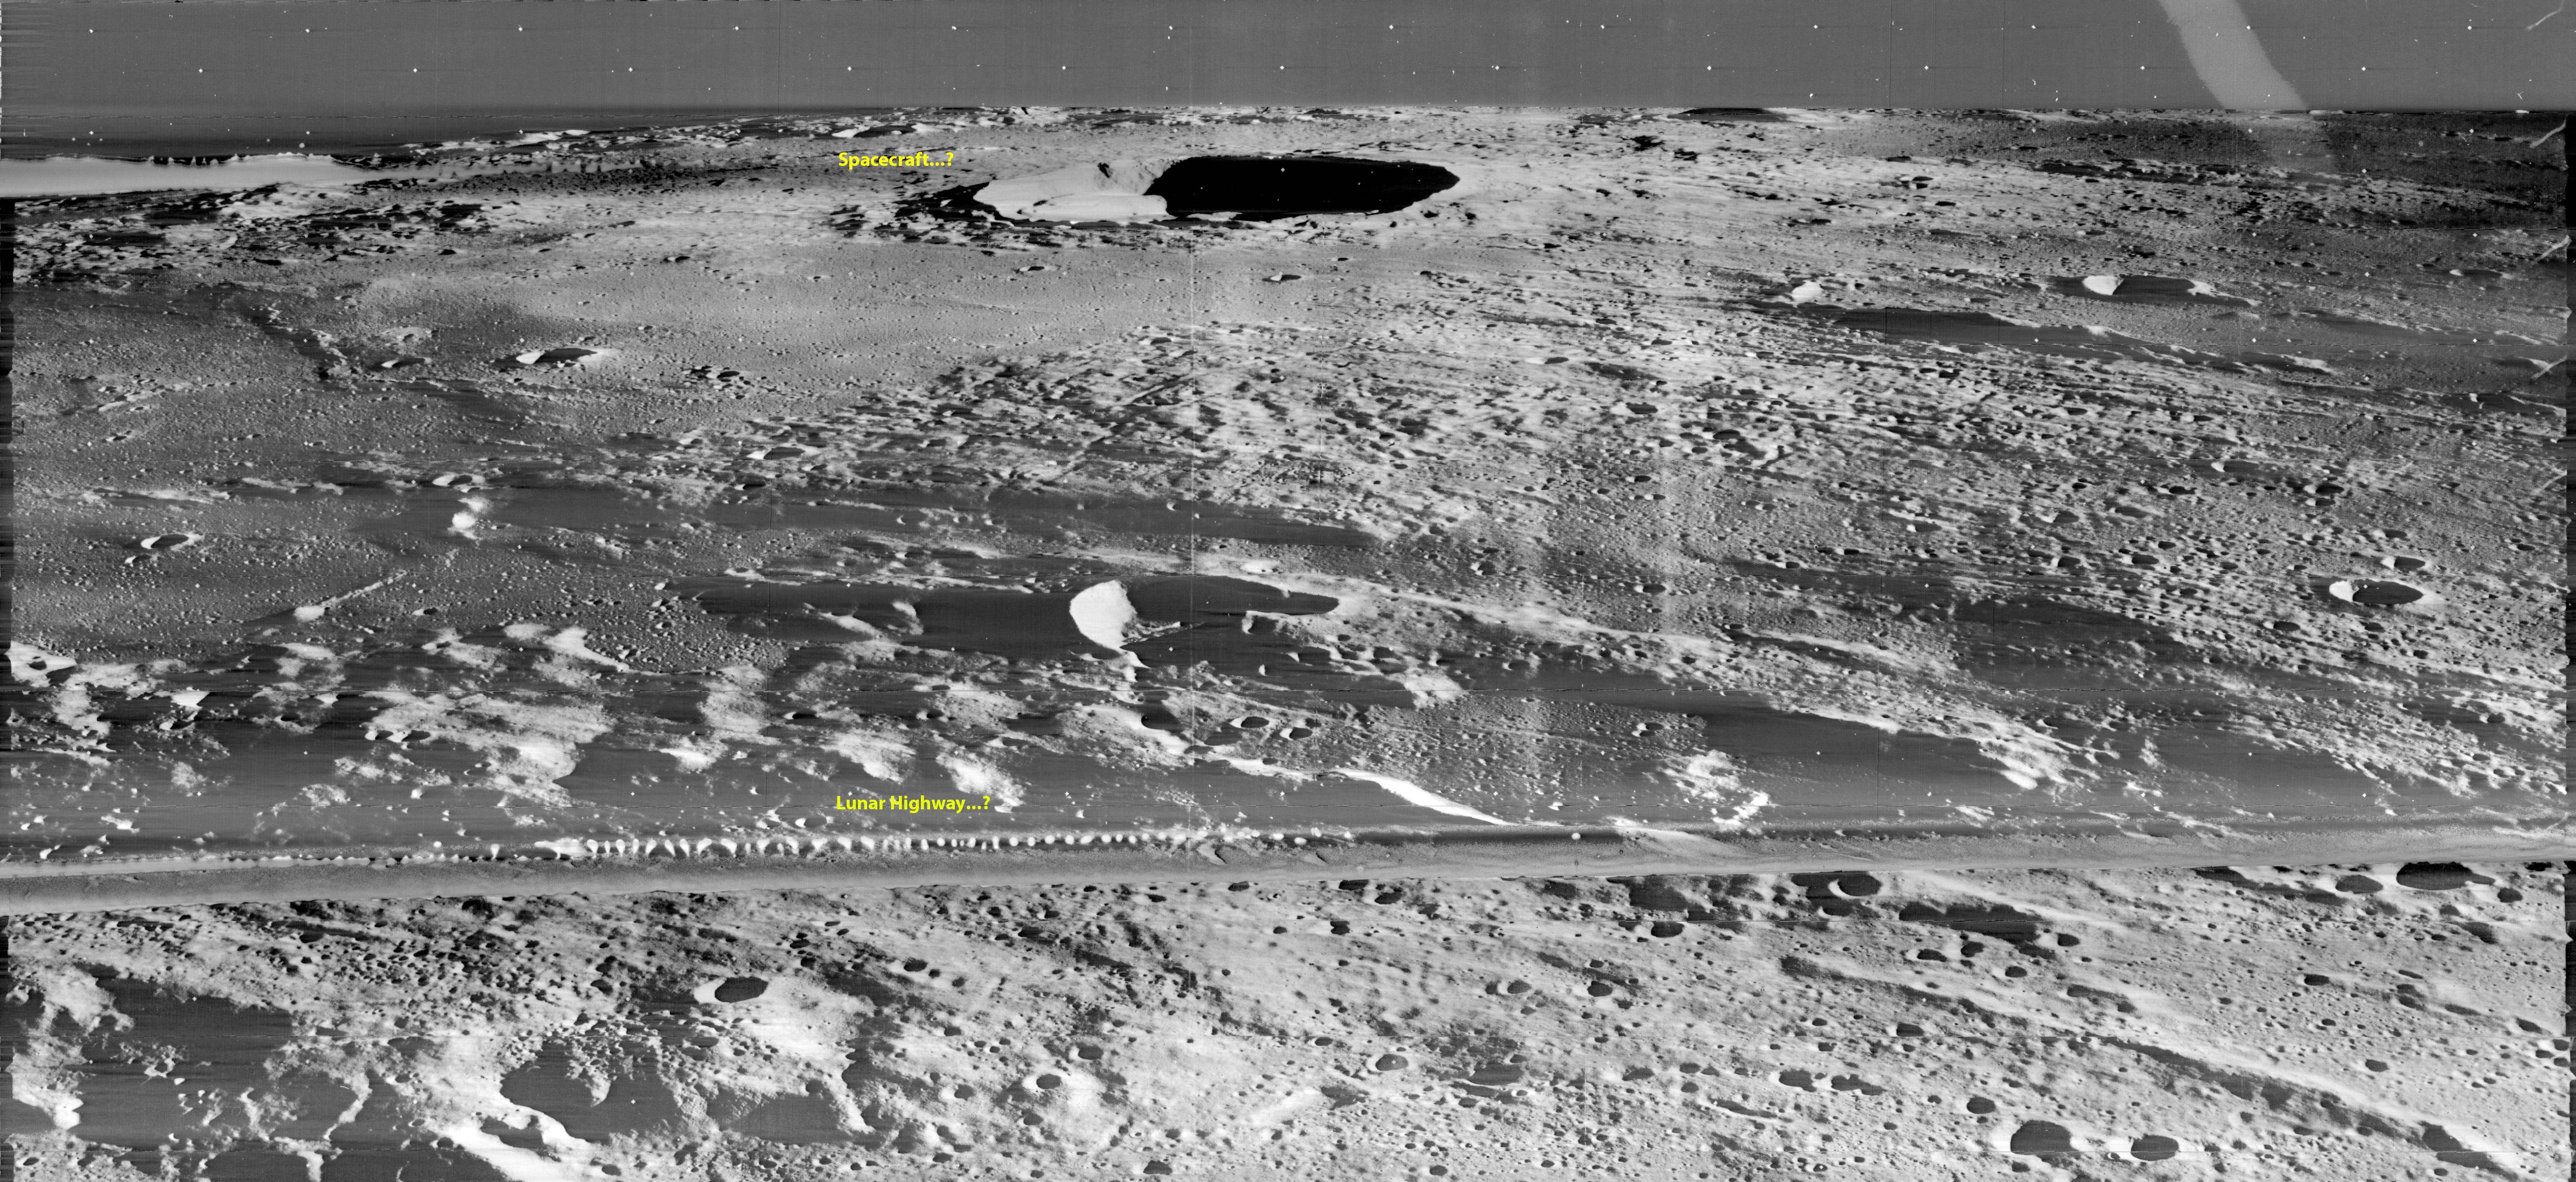 Luna 9 1st Soft Landing on the Moon  Spacecom NASA